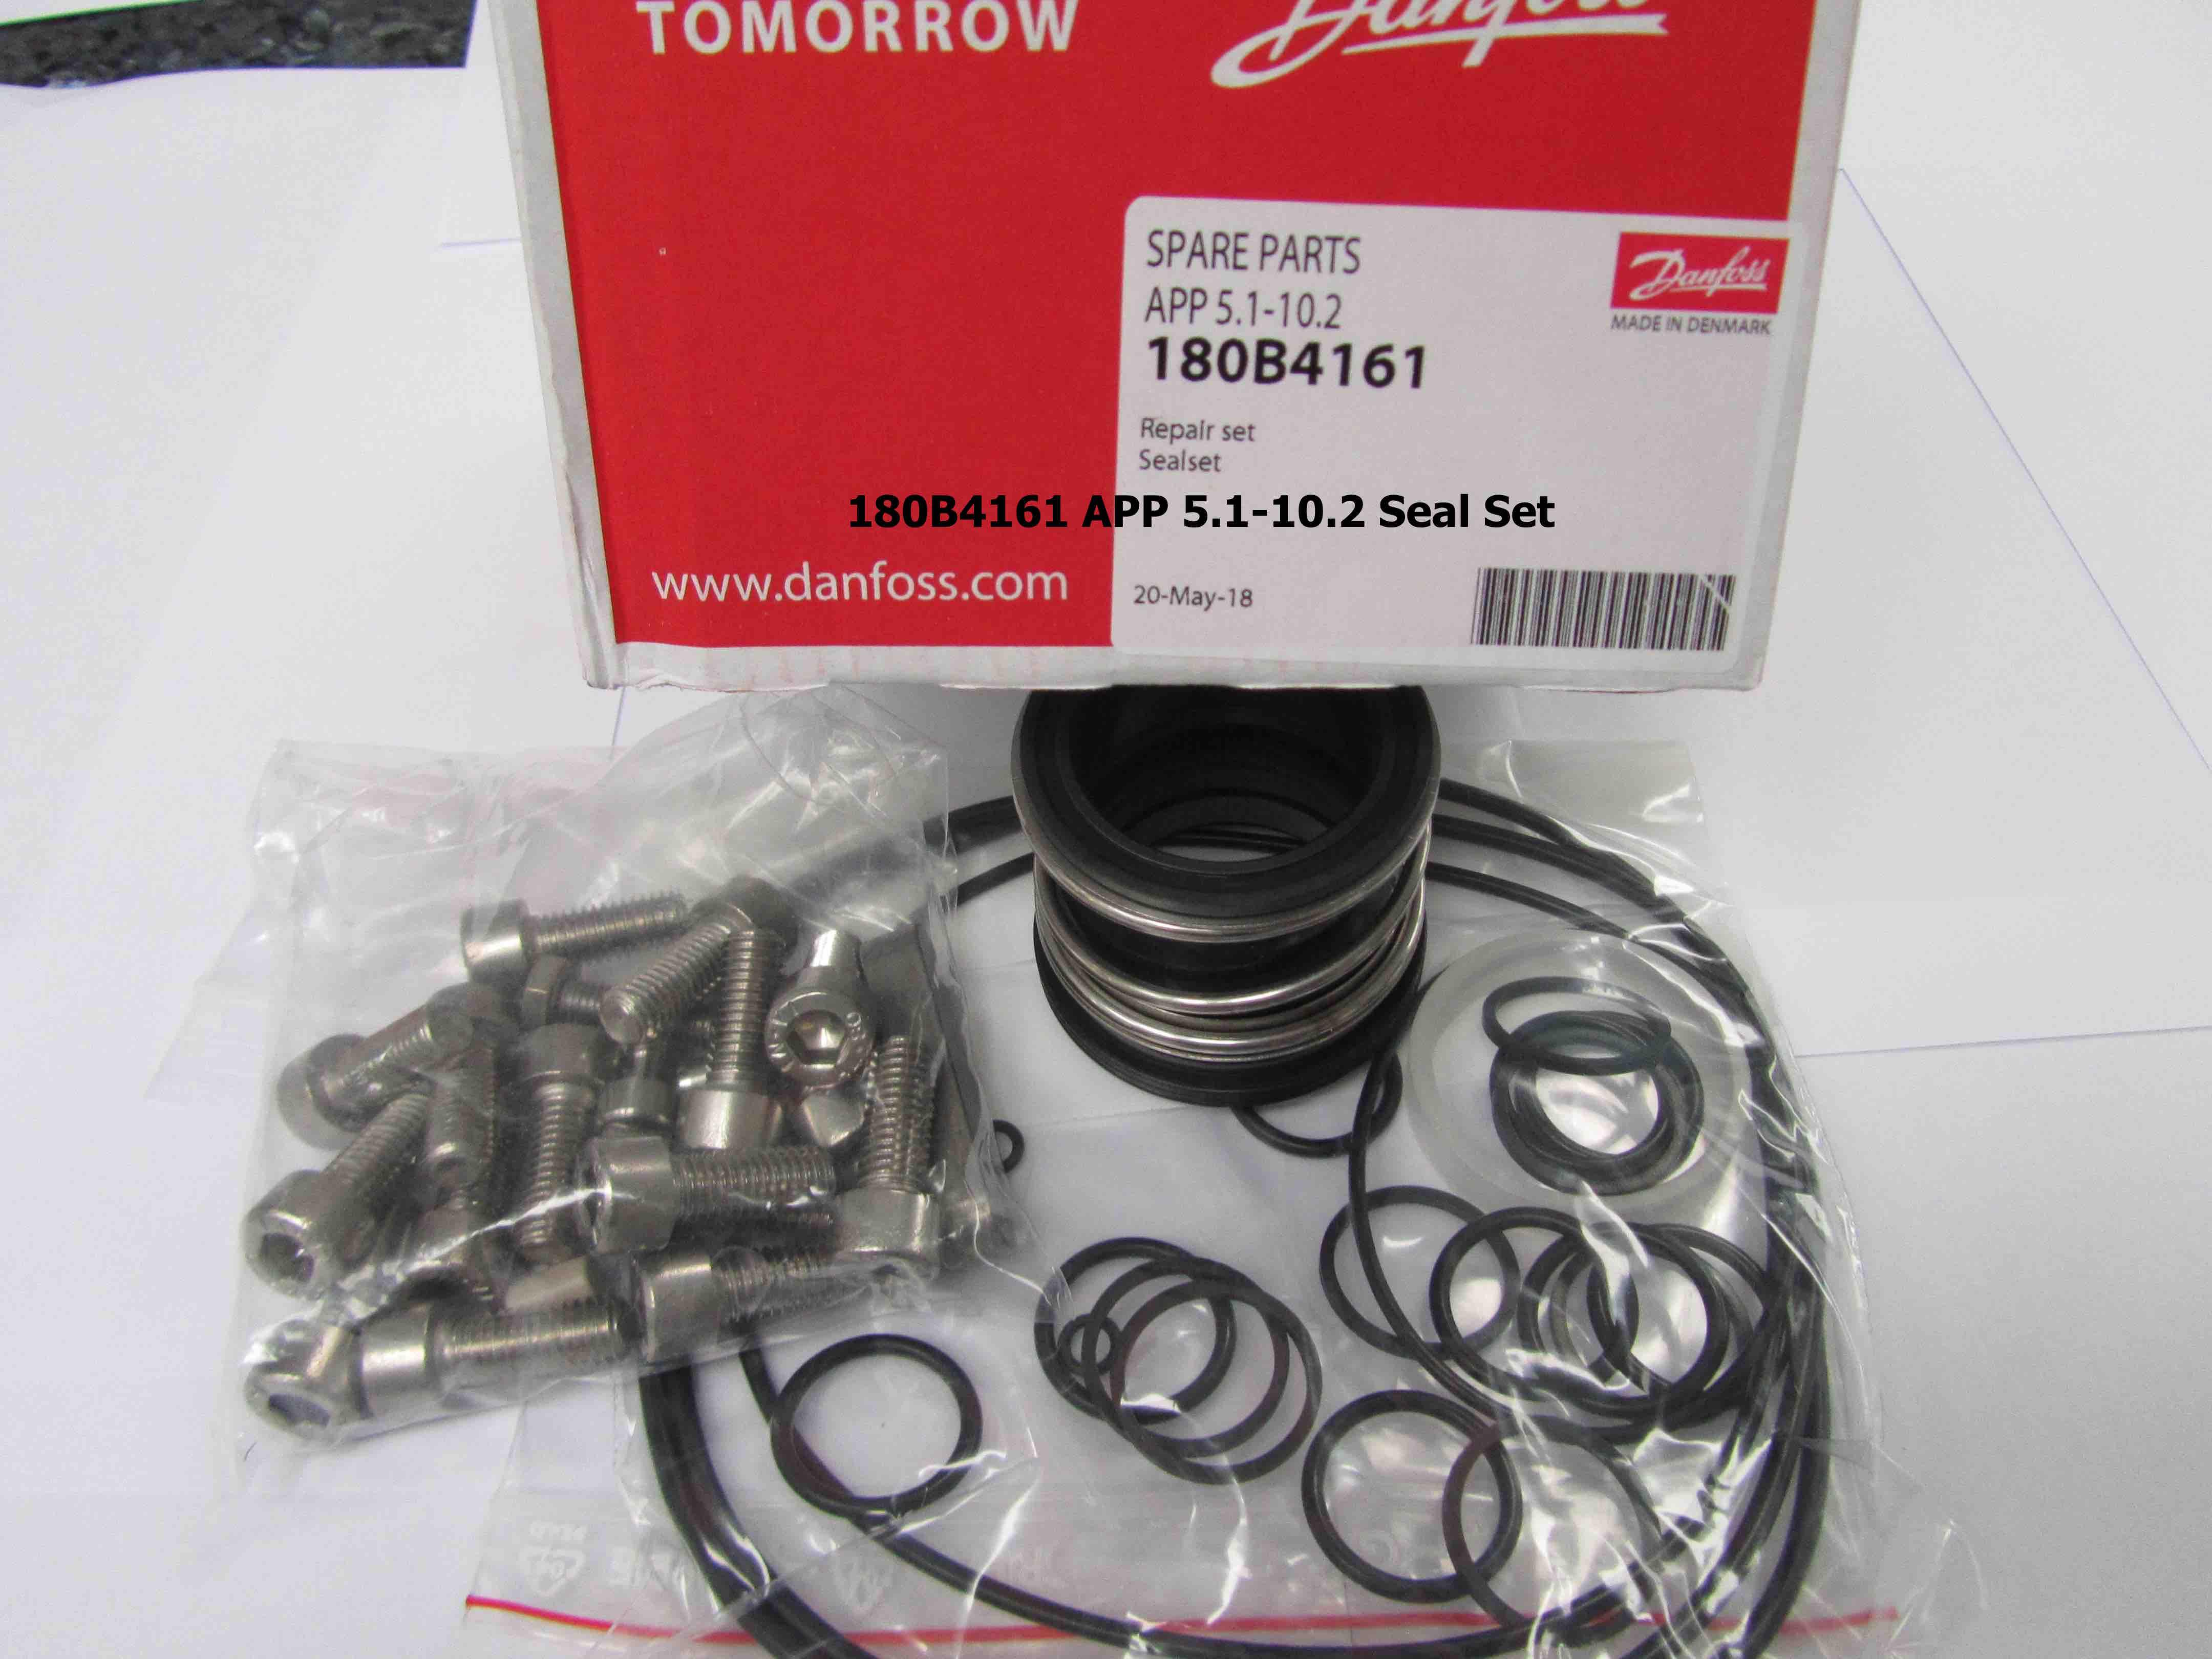 180B4161 APP 5.1-10.2 Seal Set